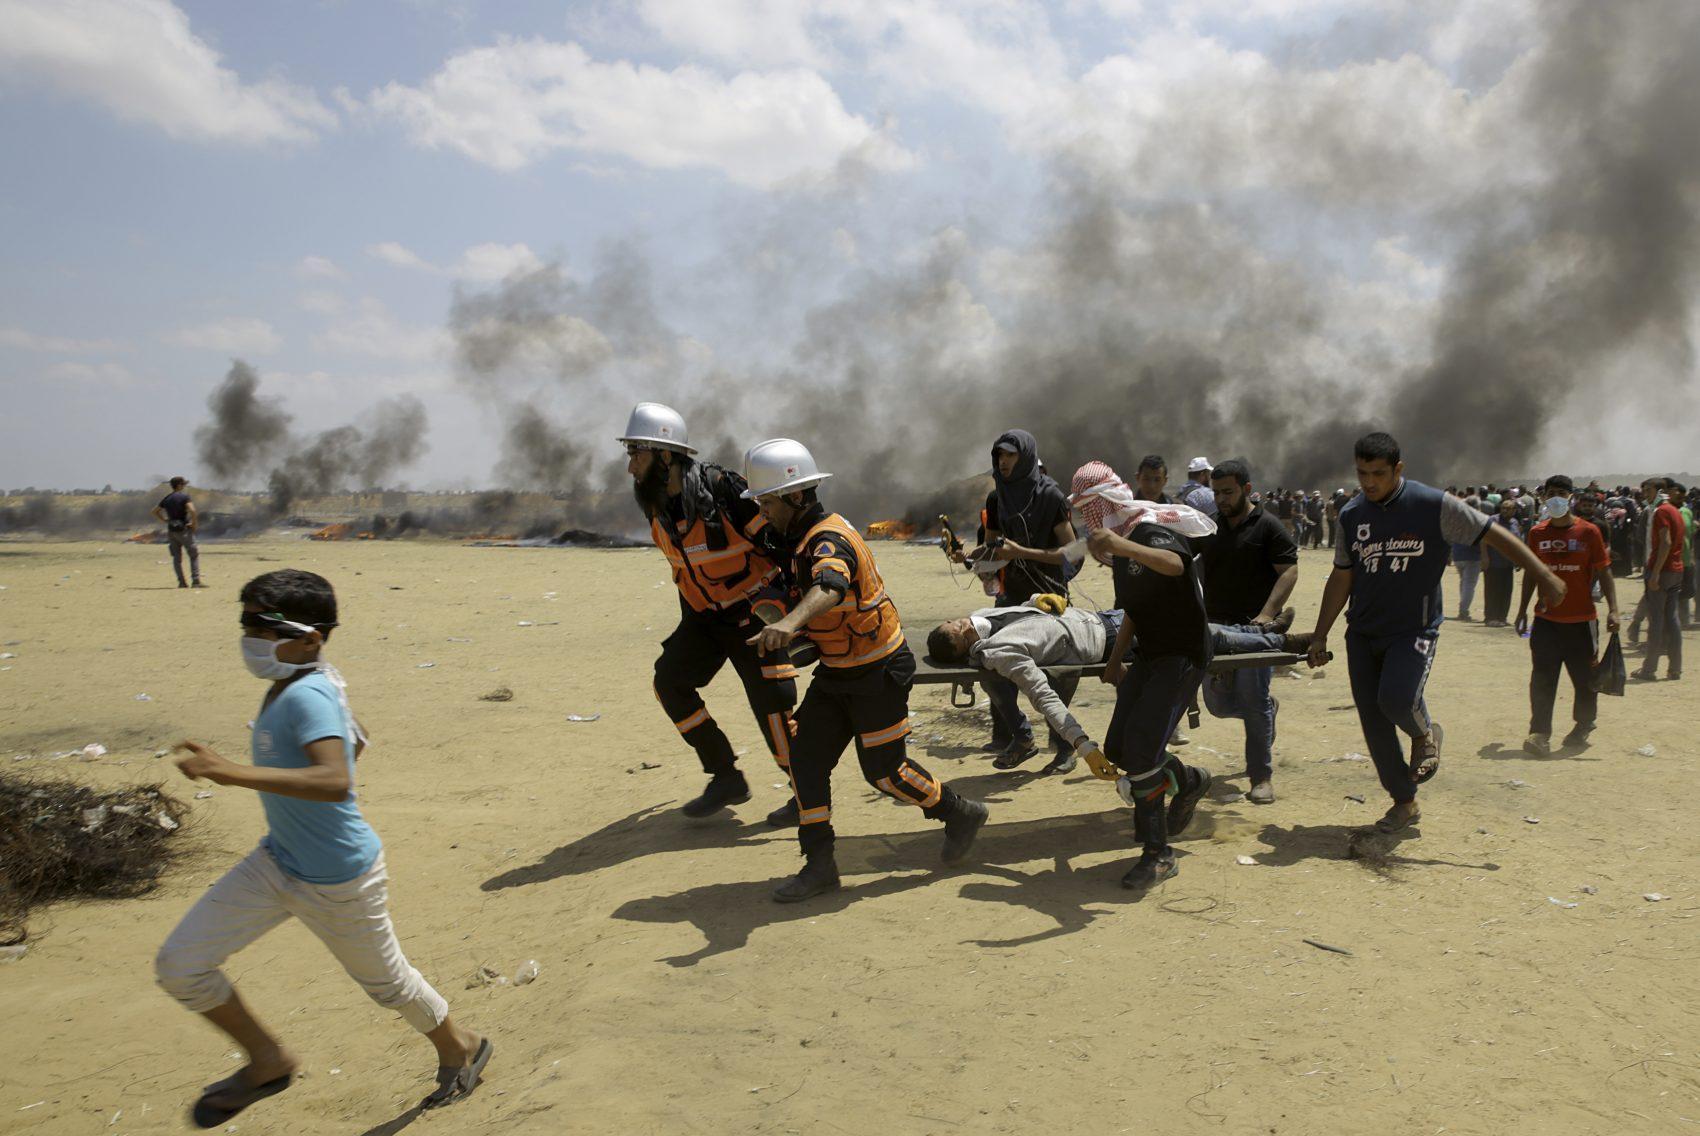 New Zealand statement on Gaza deaths 'regrettable' - Israel Embassy